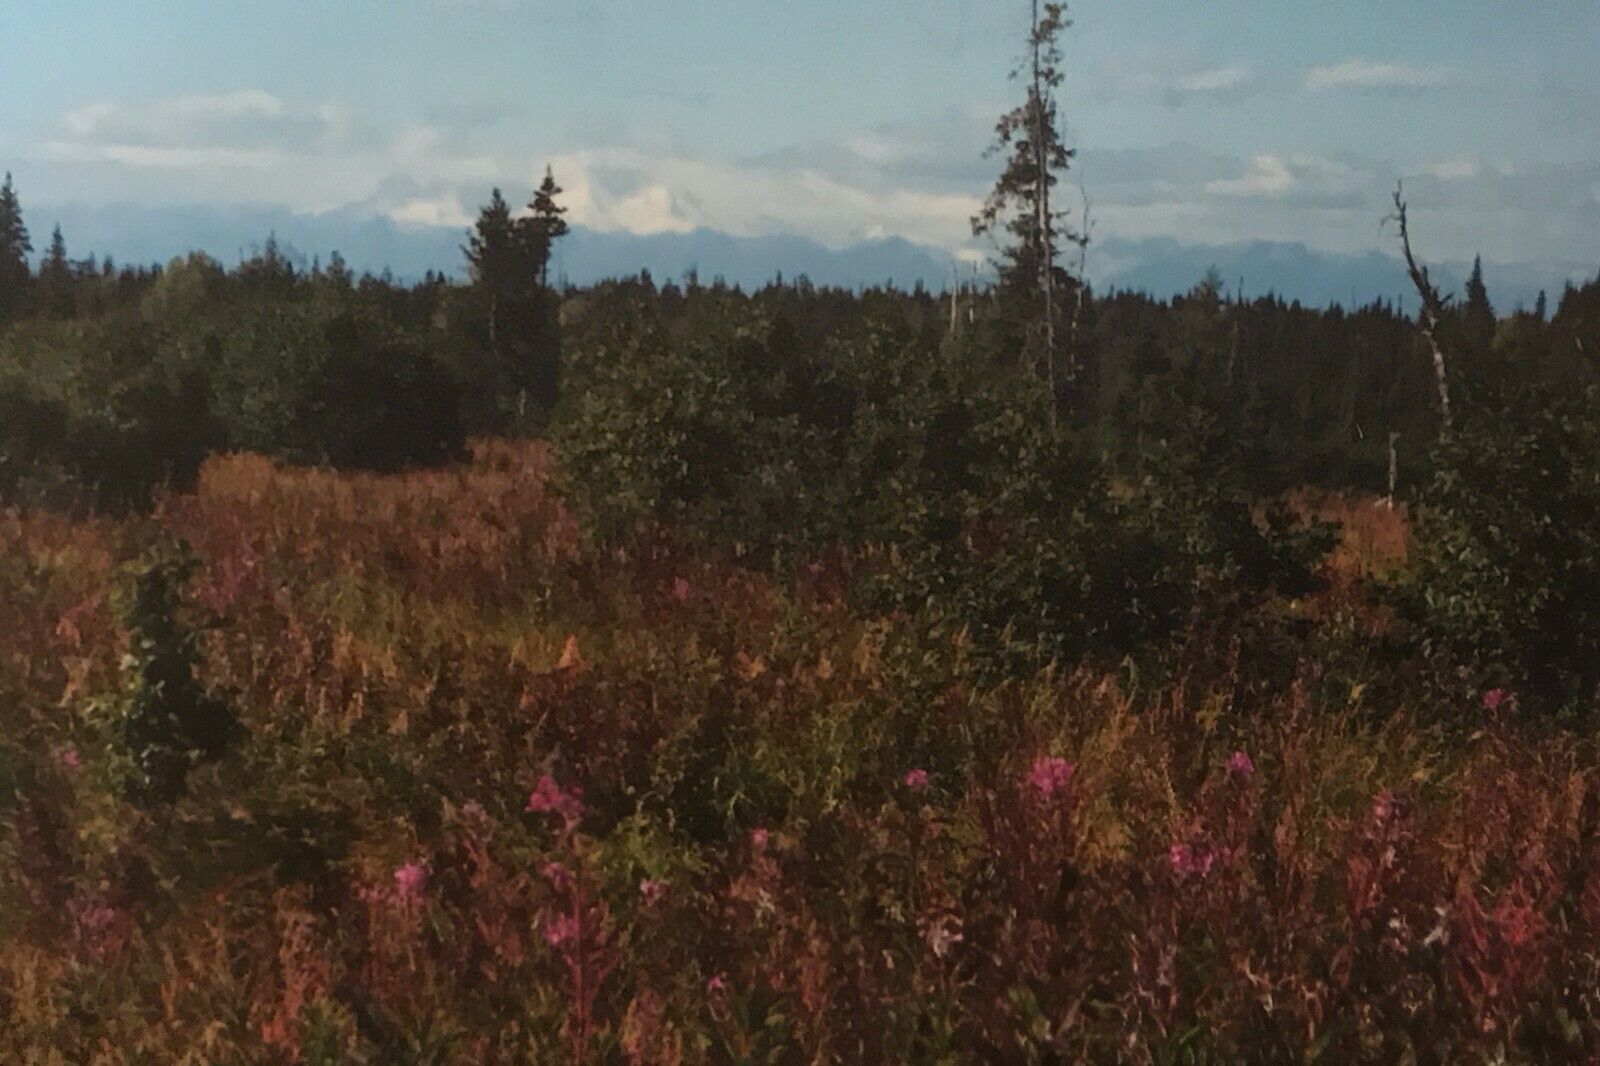 Vacant Property Homesteading Land On The Kenai Penninsula Of Alaska - $500.00